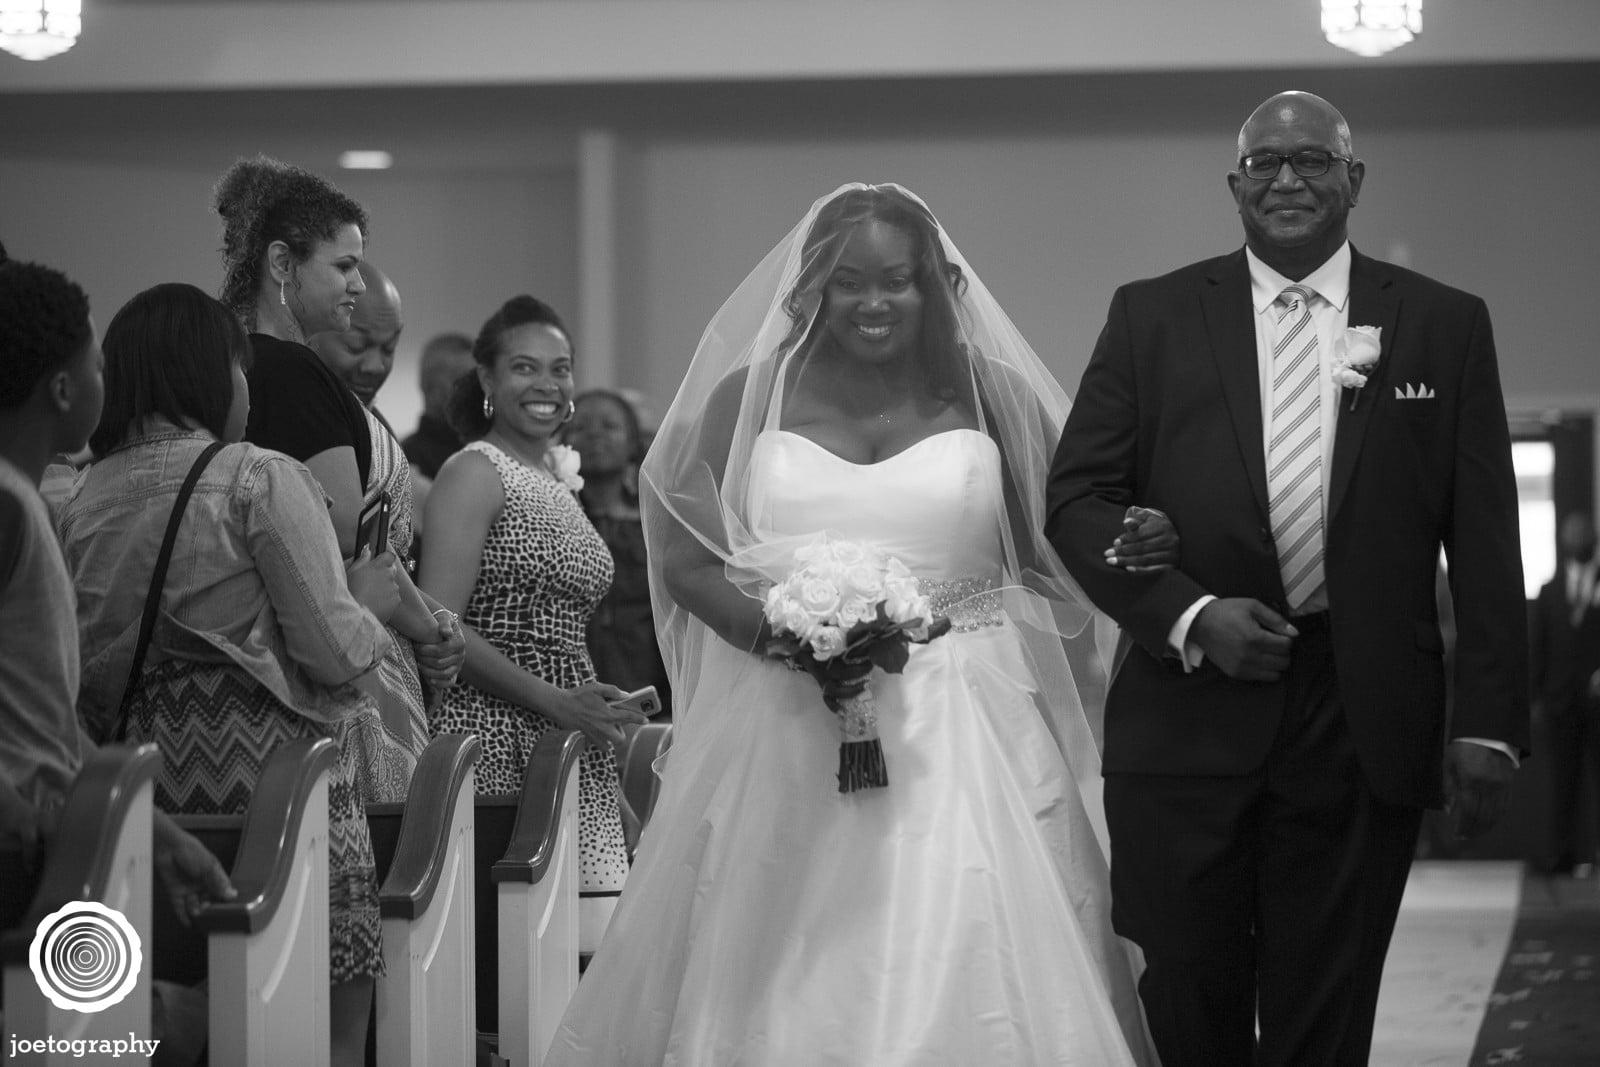 wedding-indianapolis-felix-and-adrienne-9